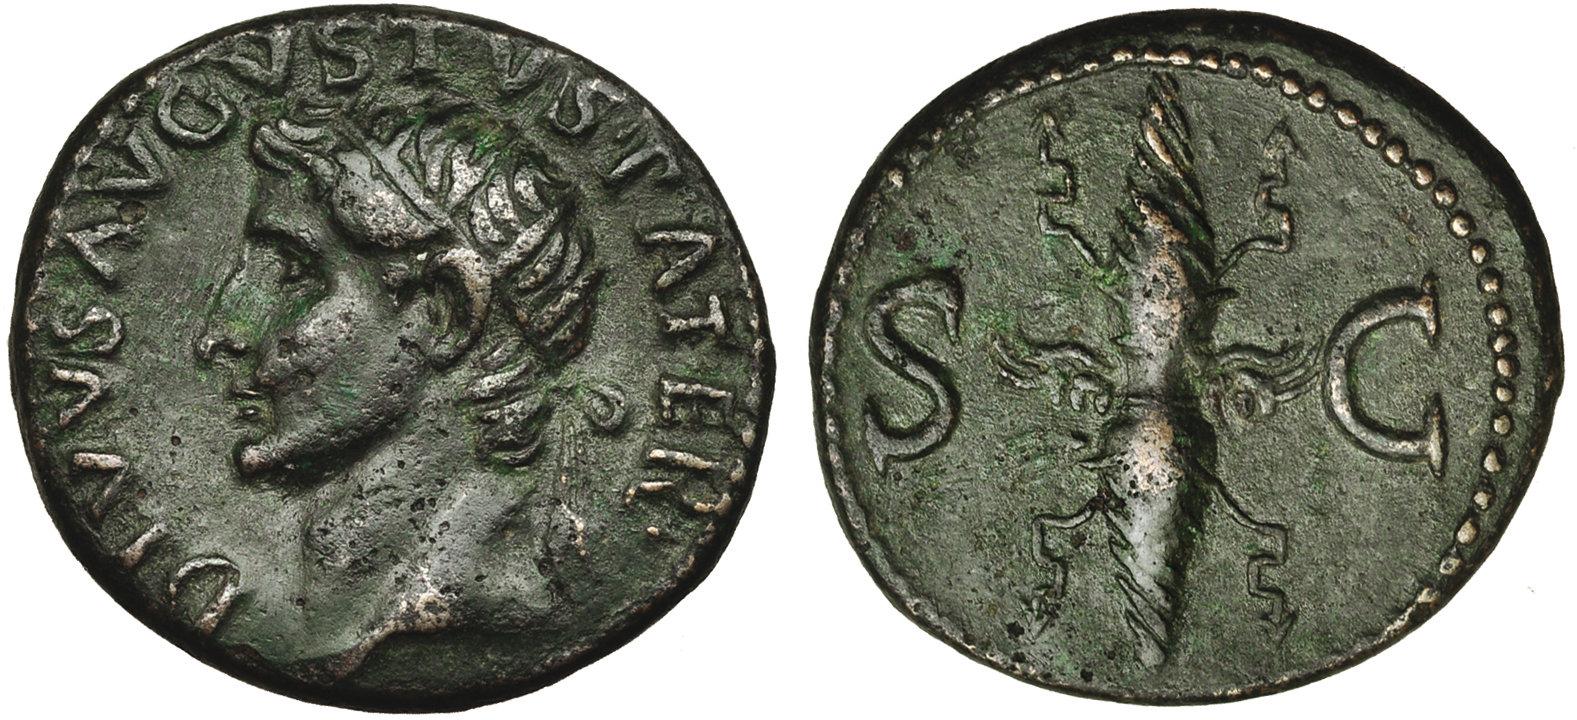 Sesterce-sestertius-sestercio Gordien Iii/ Apollon r1 Splendide Et Rare